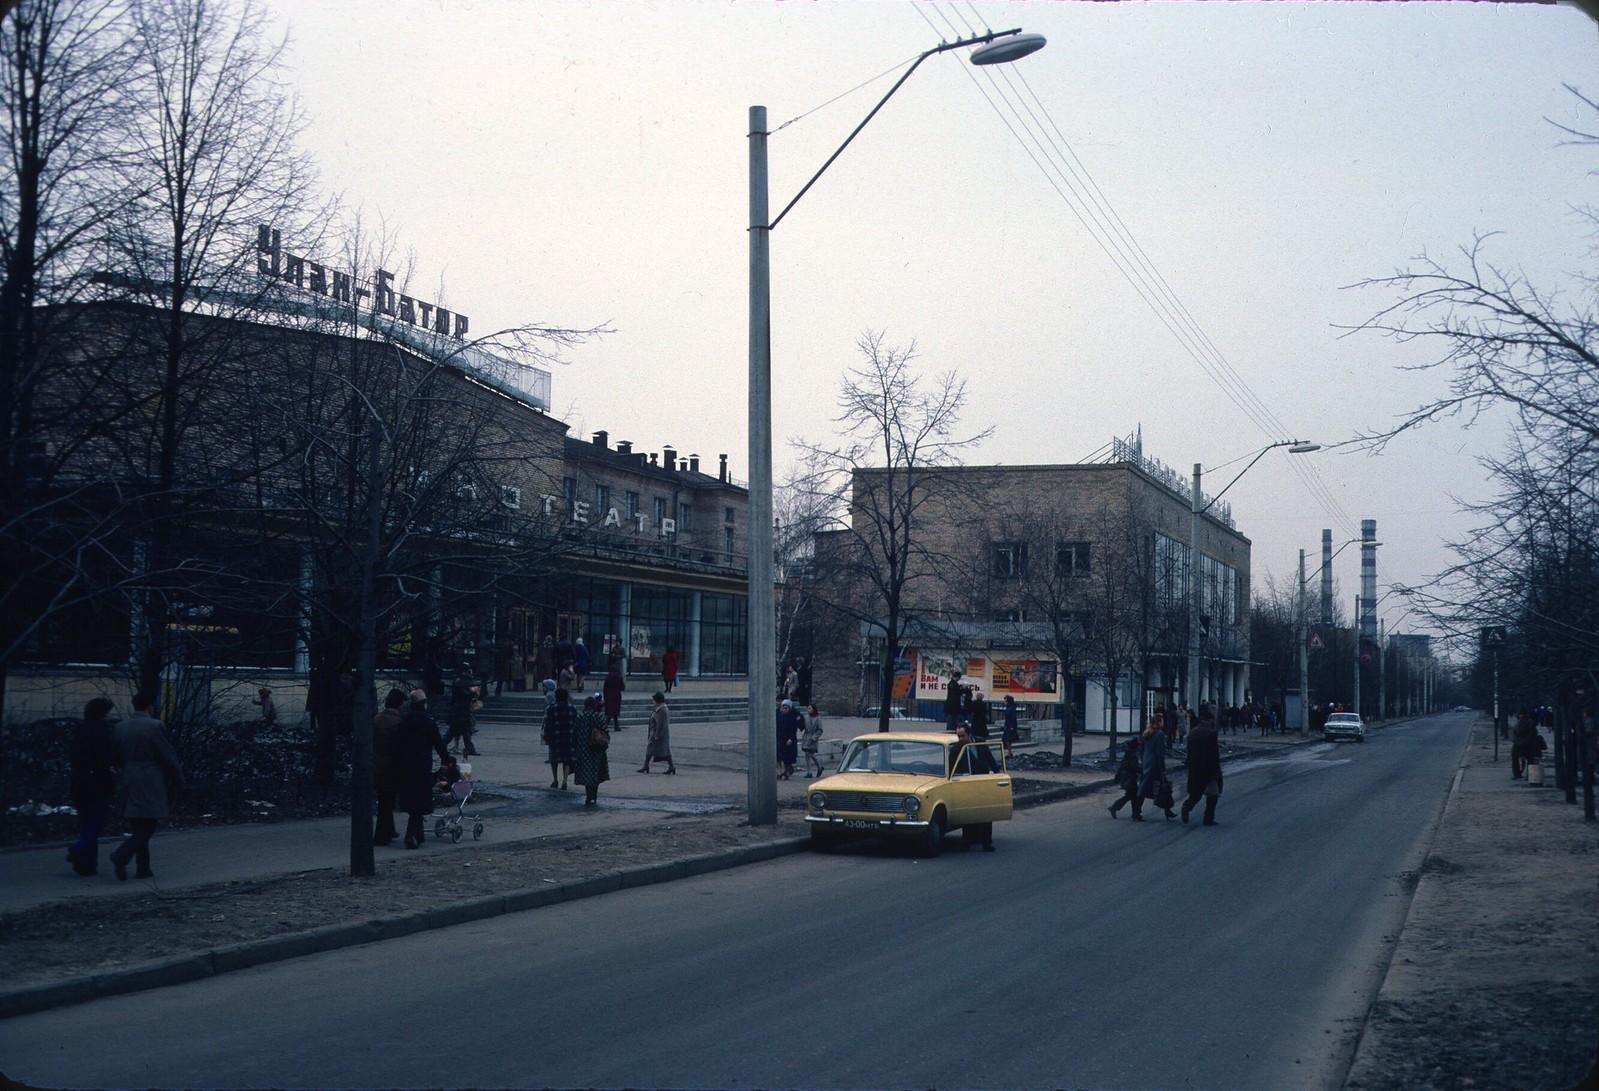 Улица Гримау. Кинотеатр Улан-Батор